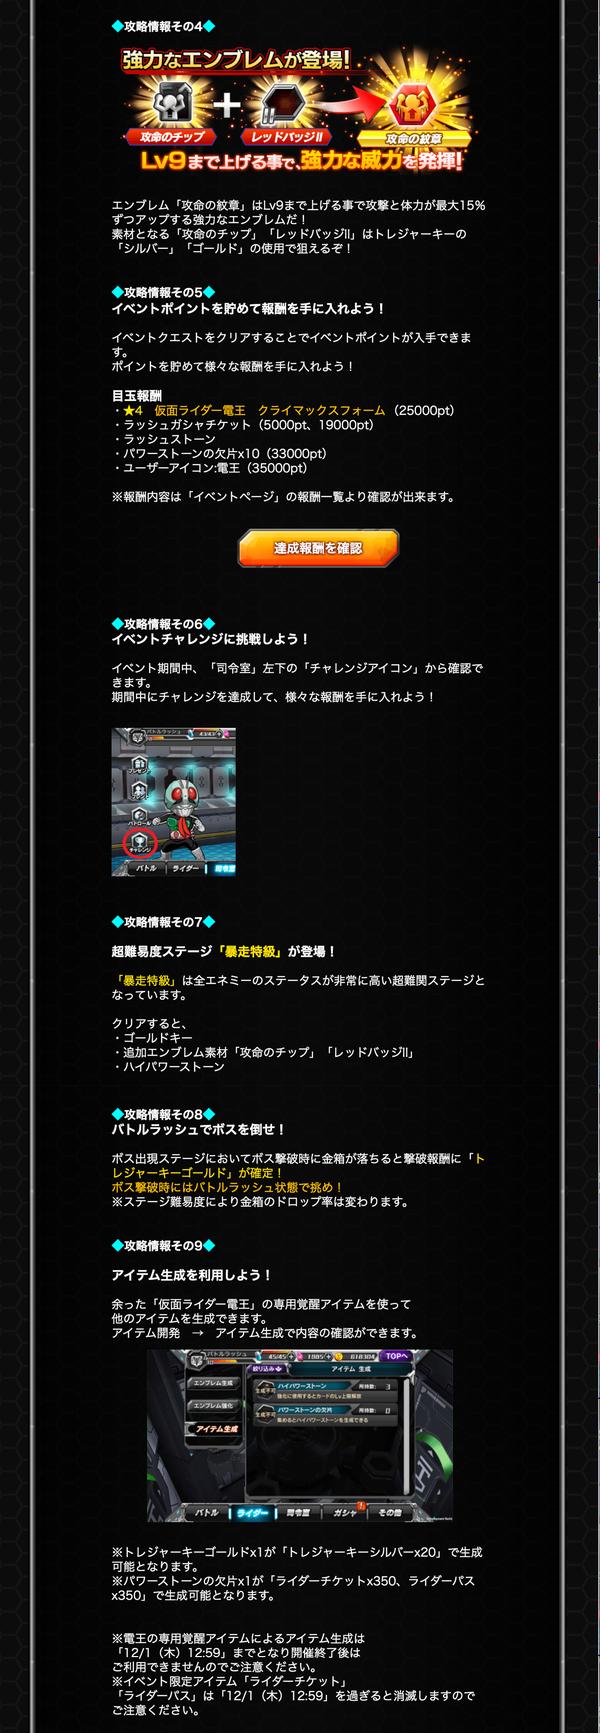 f:id:ich-ichi:20161112014132p:plain